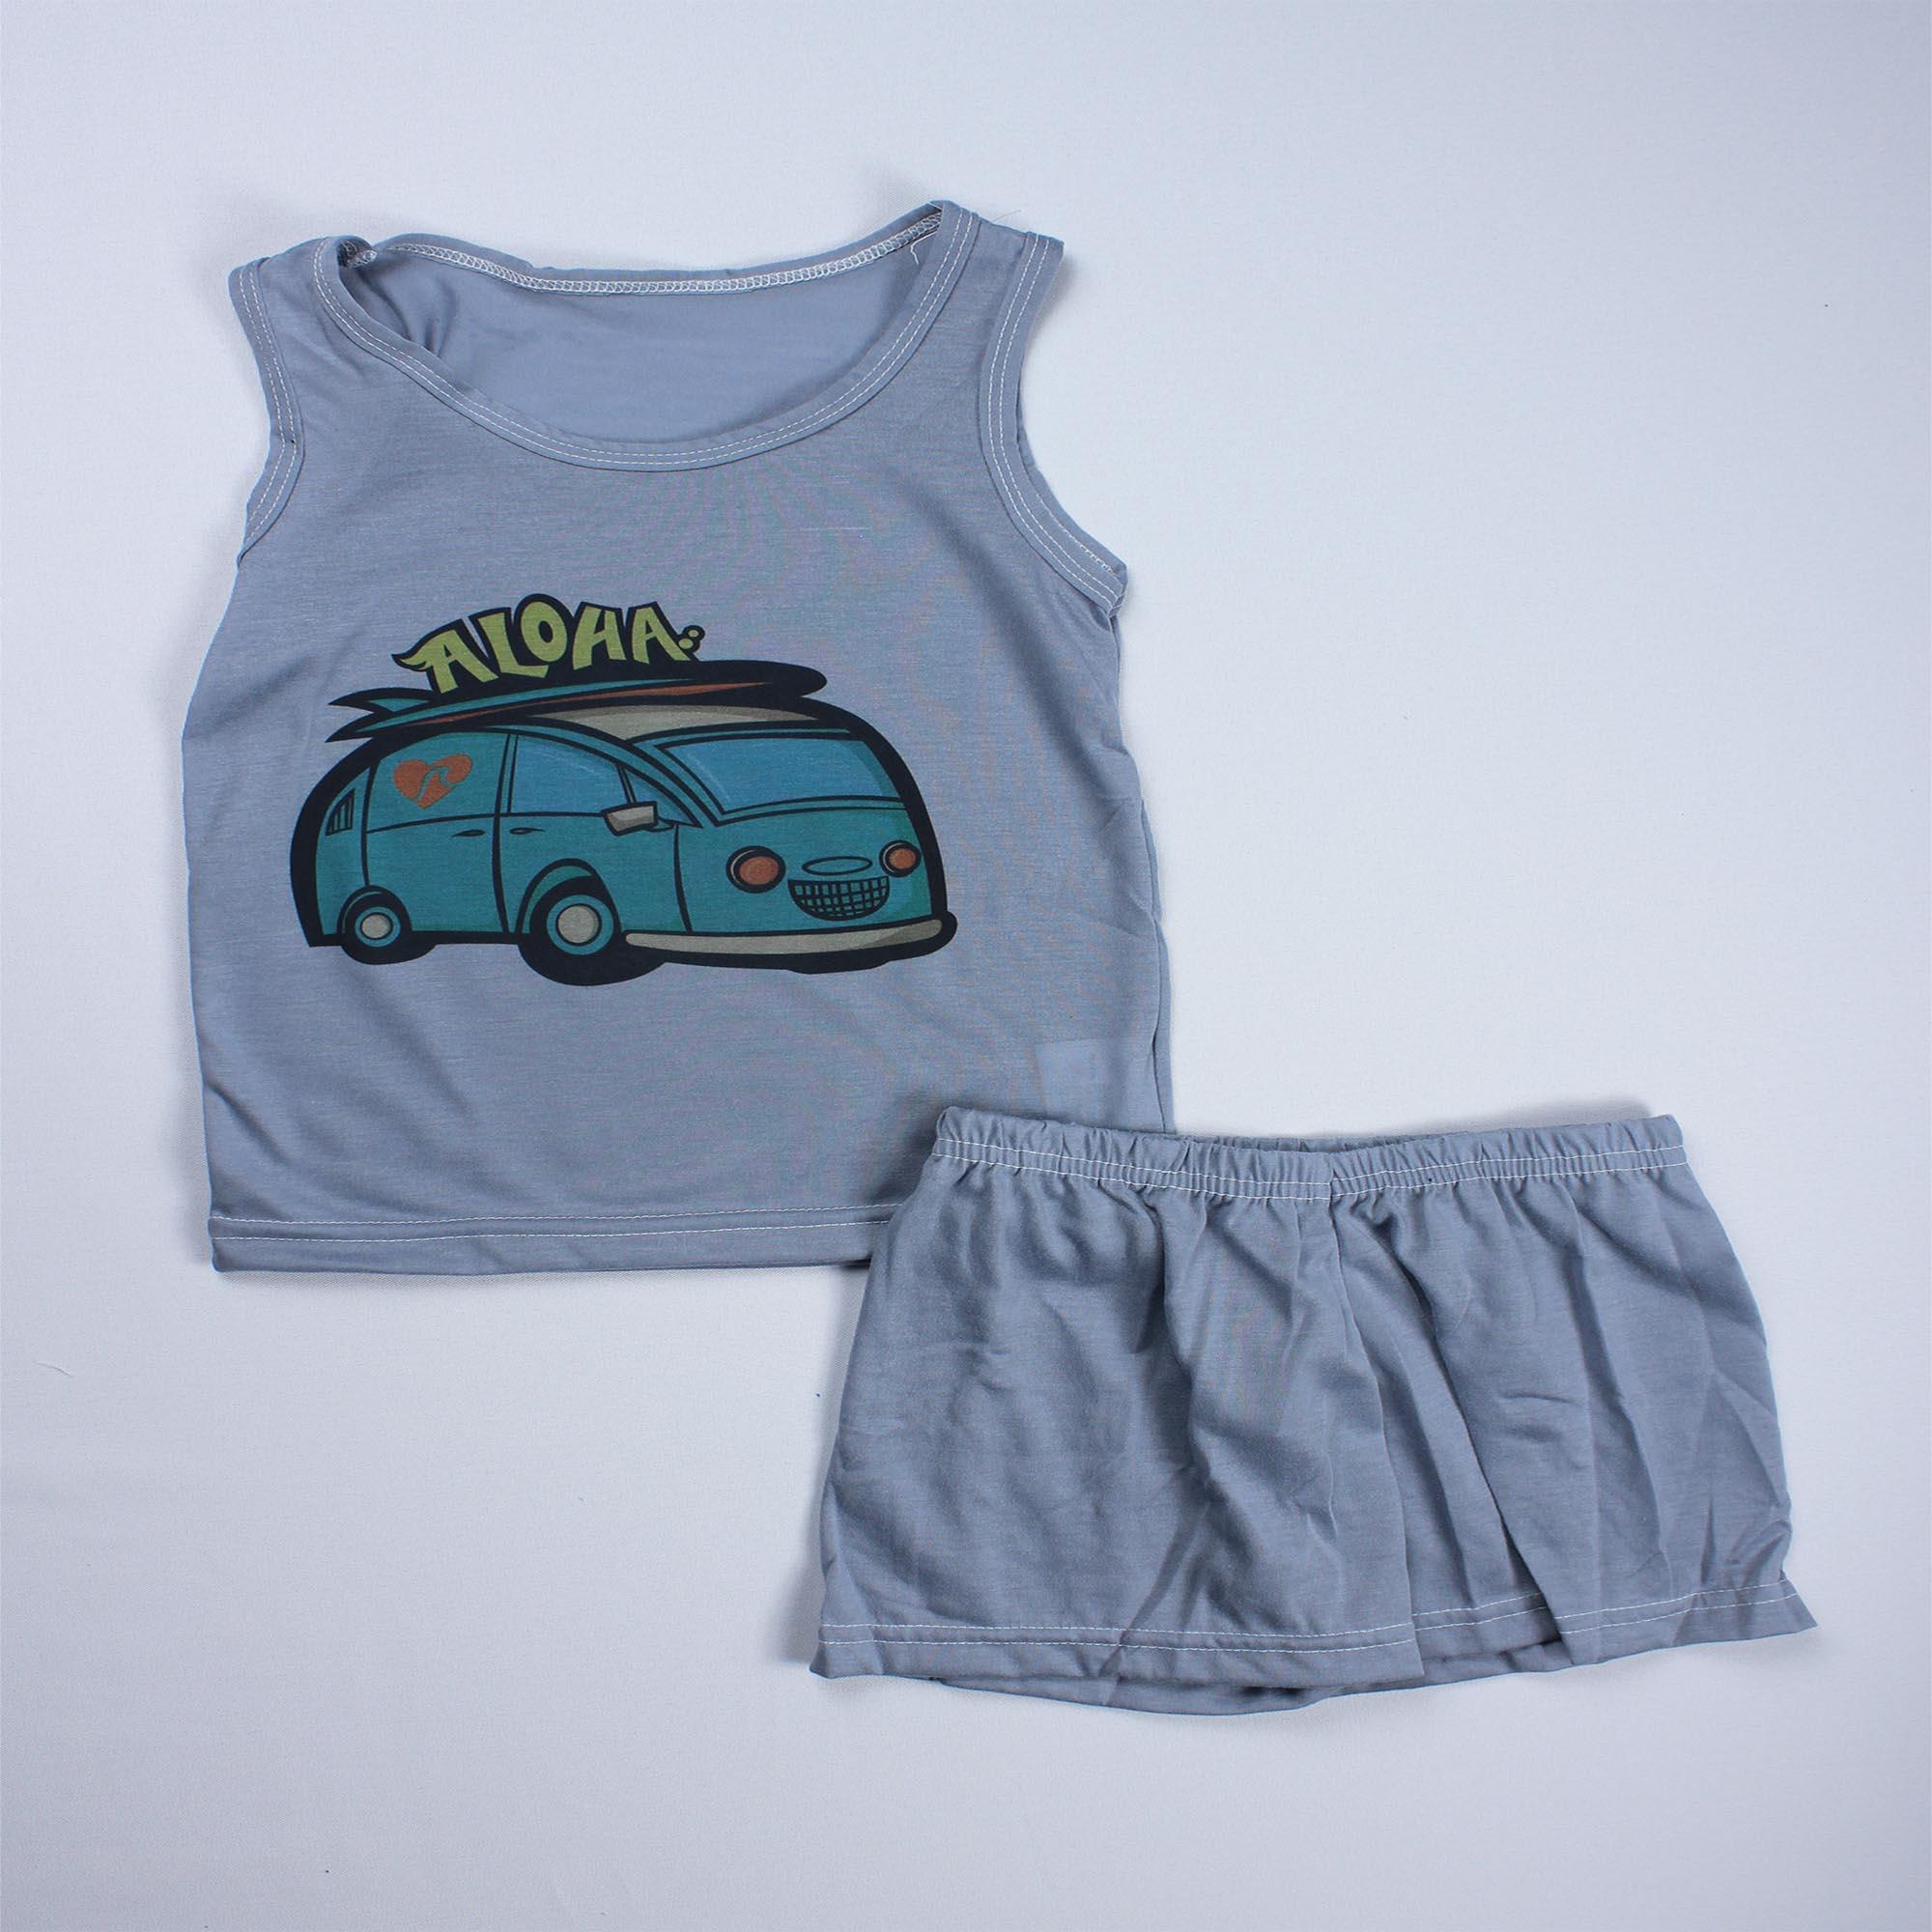 Pijama Regata Infantil Menino - Tamanho 6